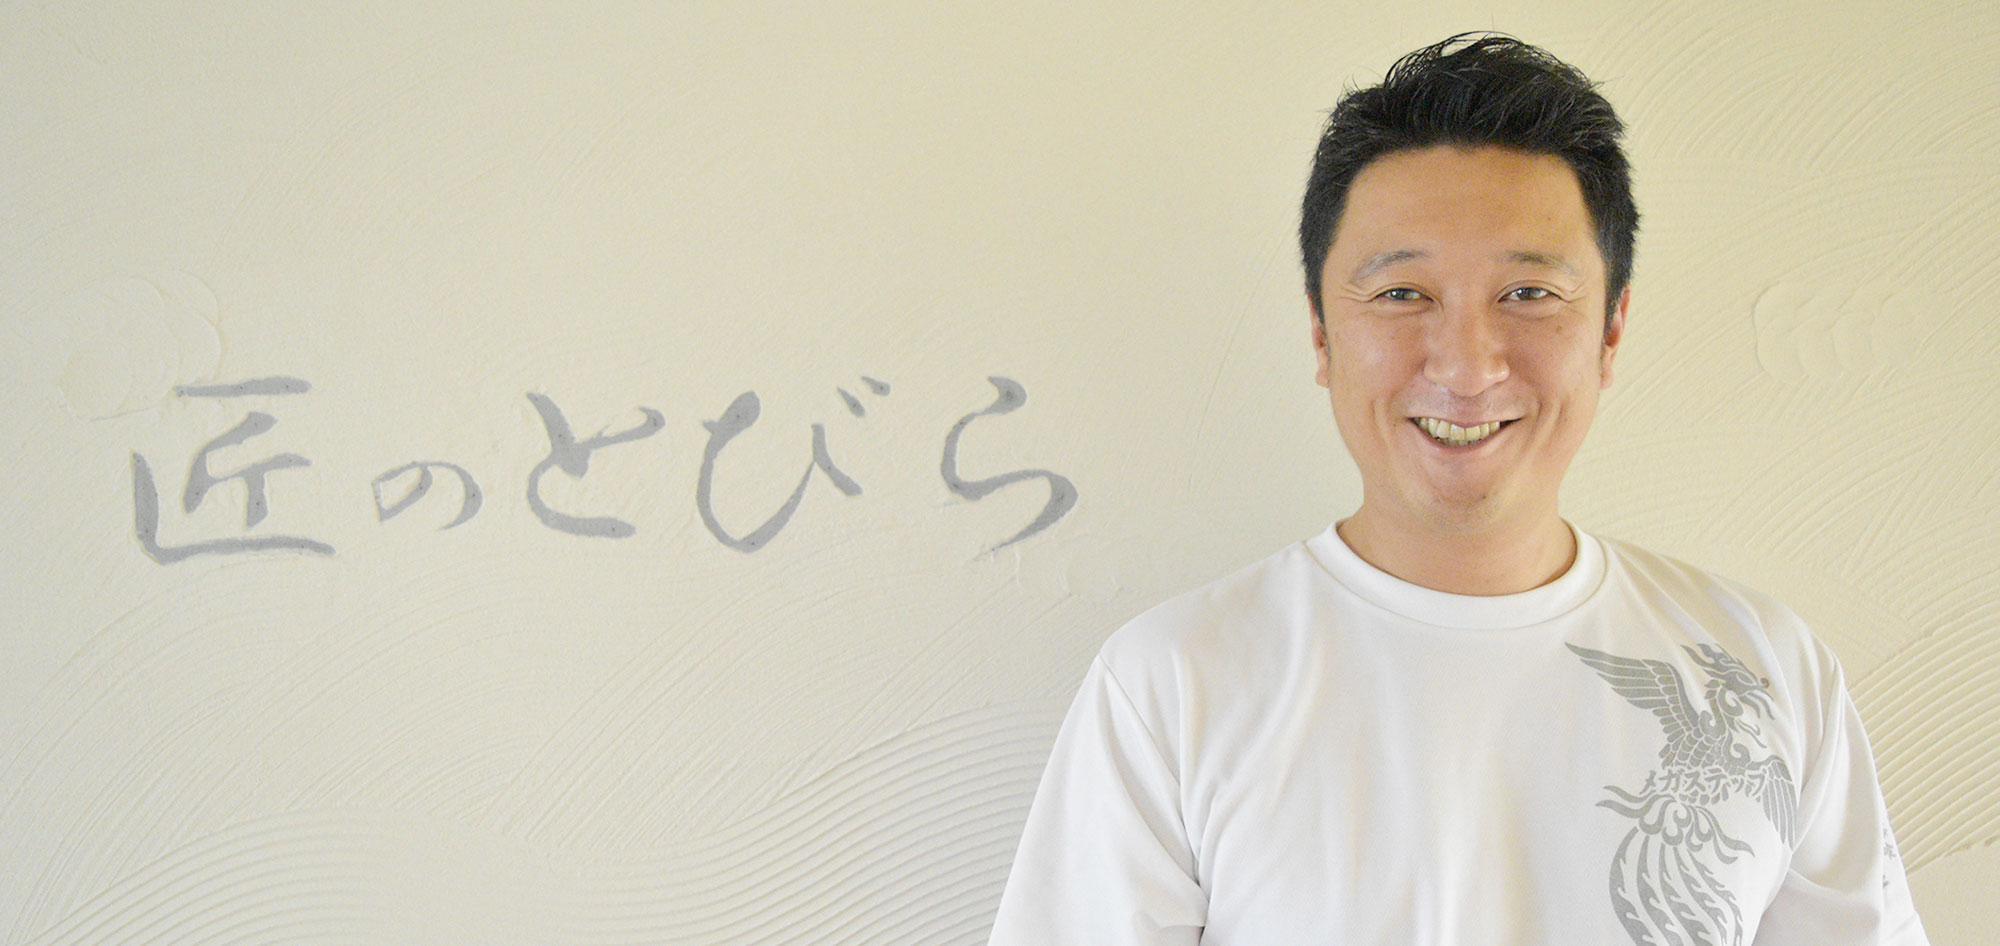 職人道場® 創設者 株式会社メガステップ 代表取締役 小山 宗一郎